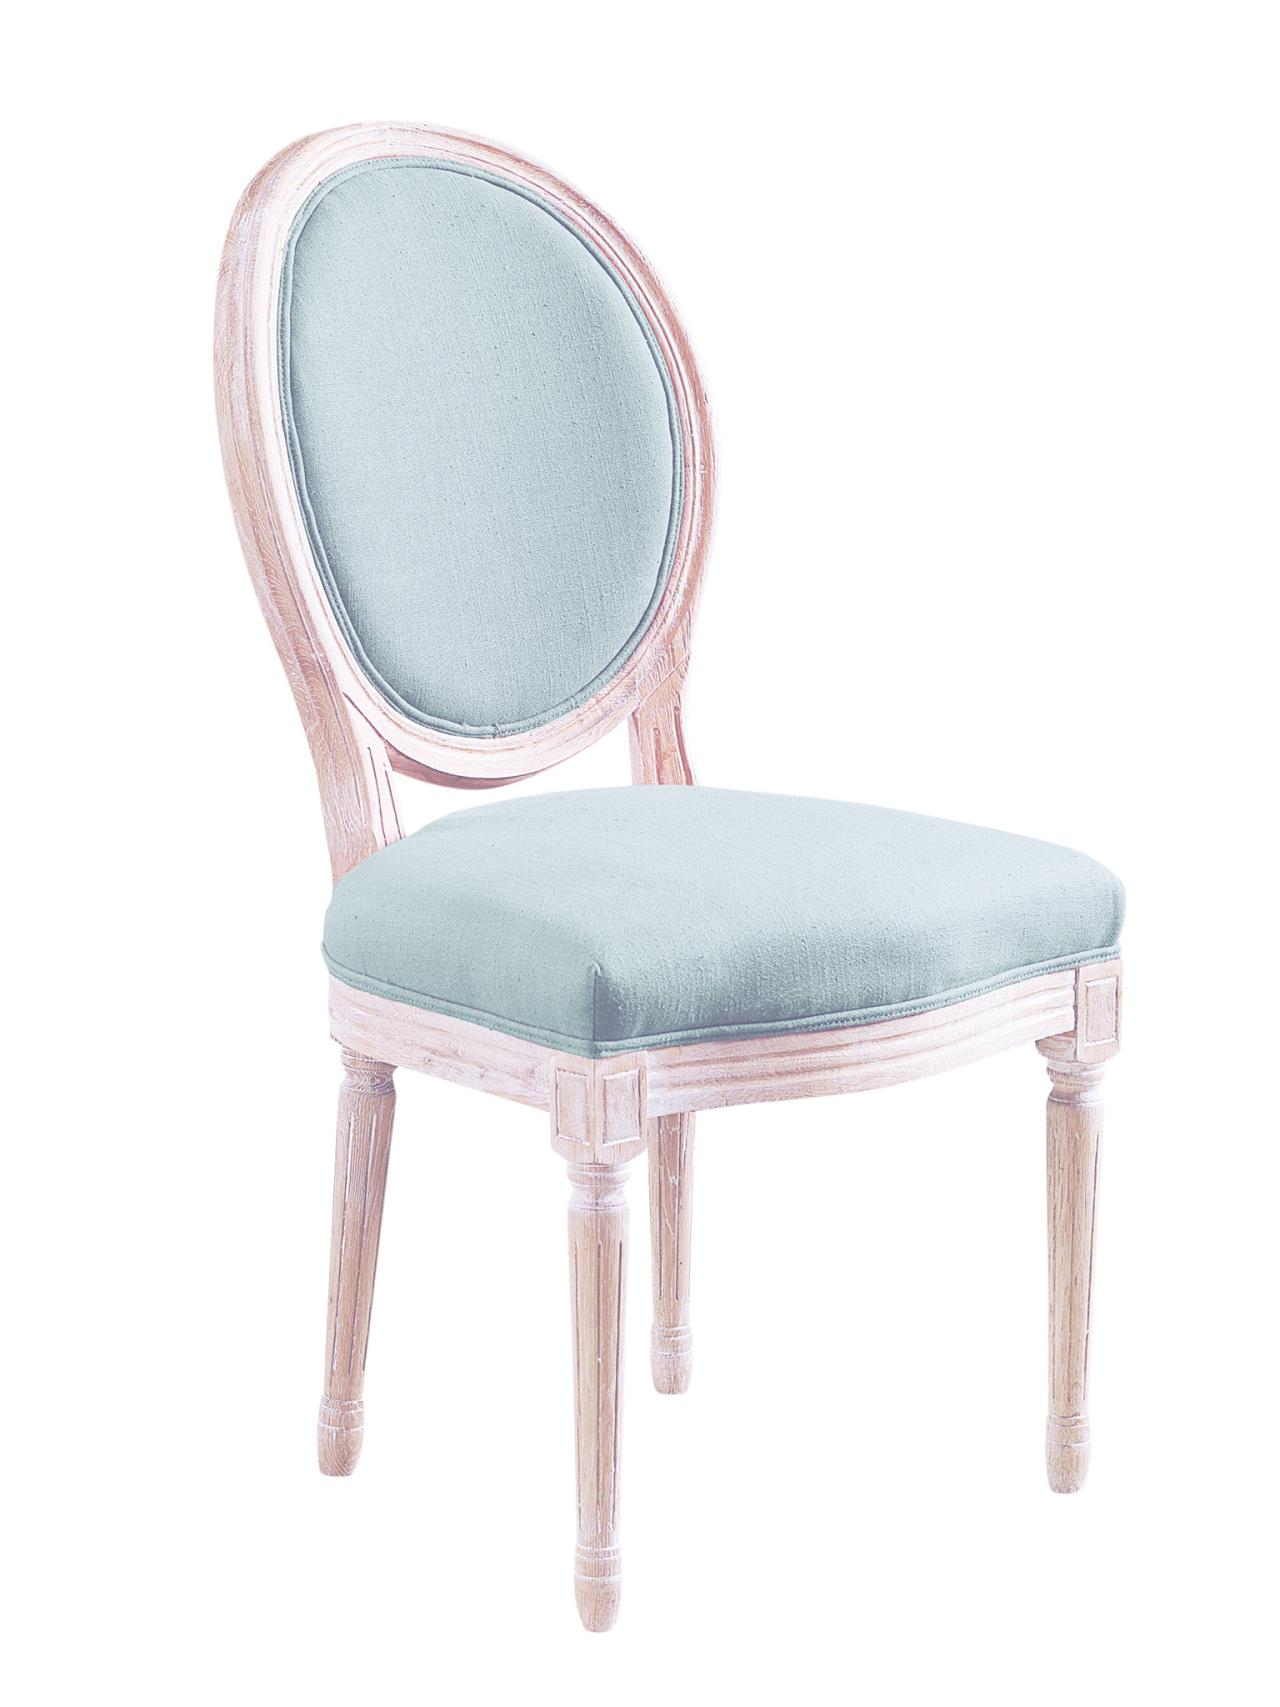 Light blue dining chairs - Light Blue Dining Chair